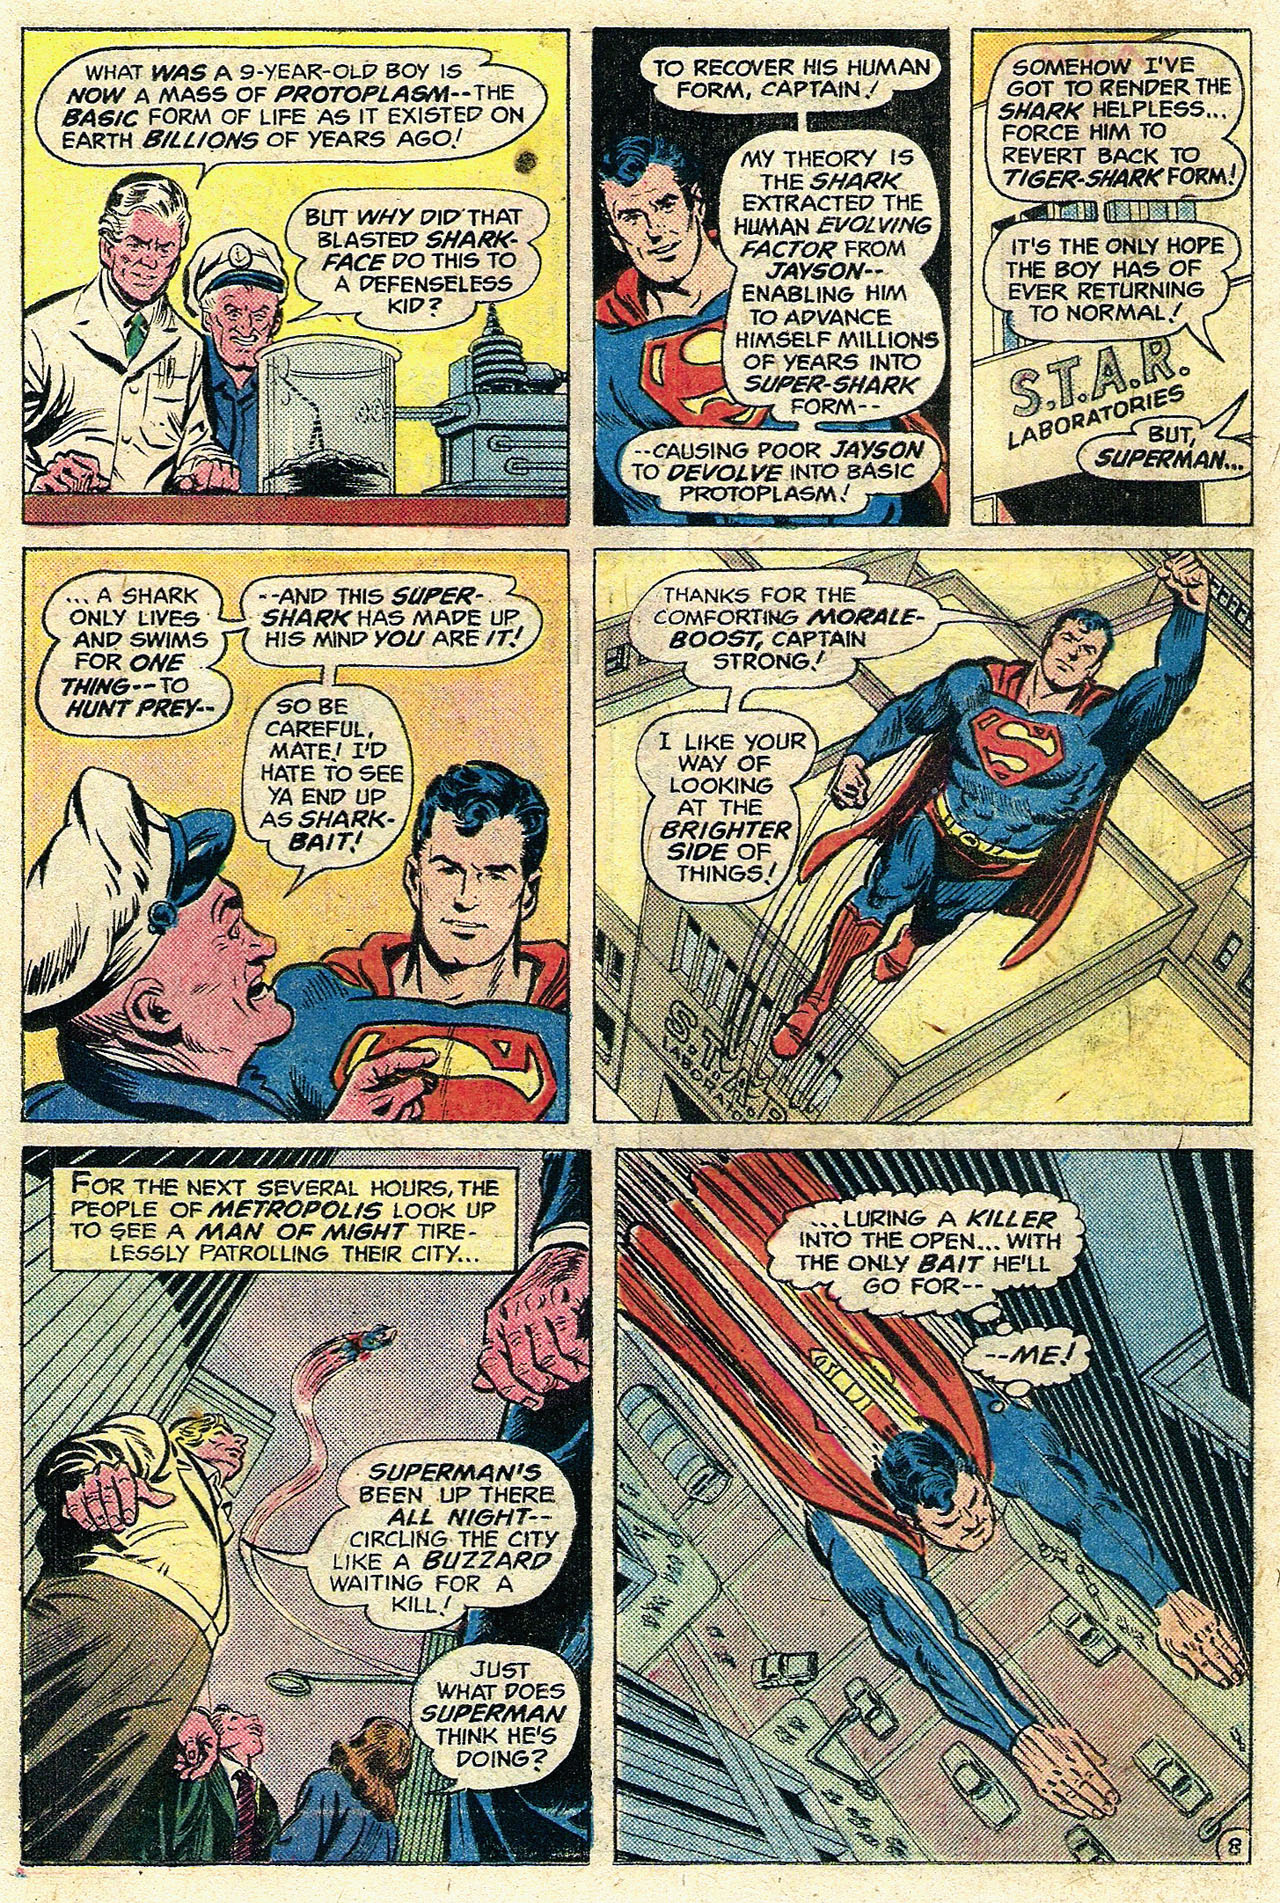 Action Comics (1938) 456 Page 14